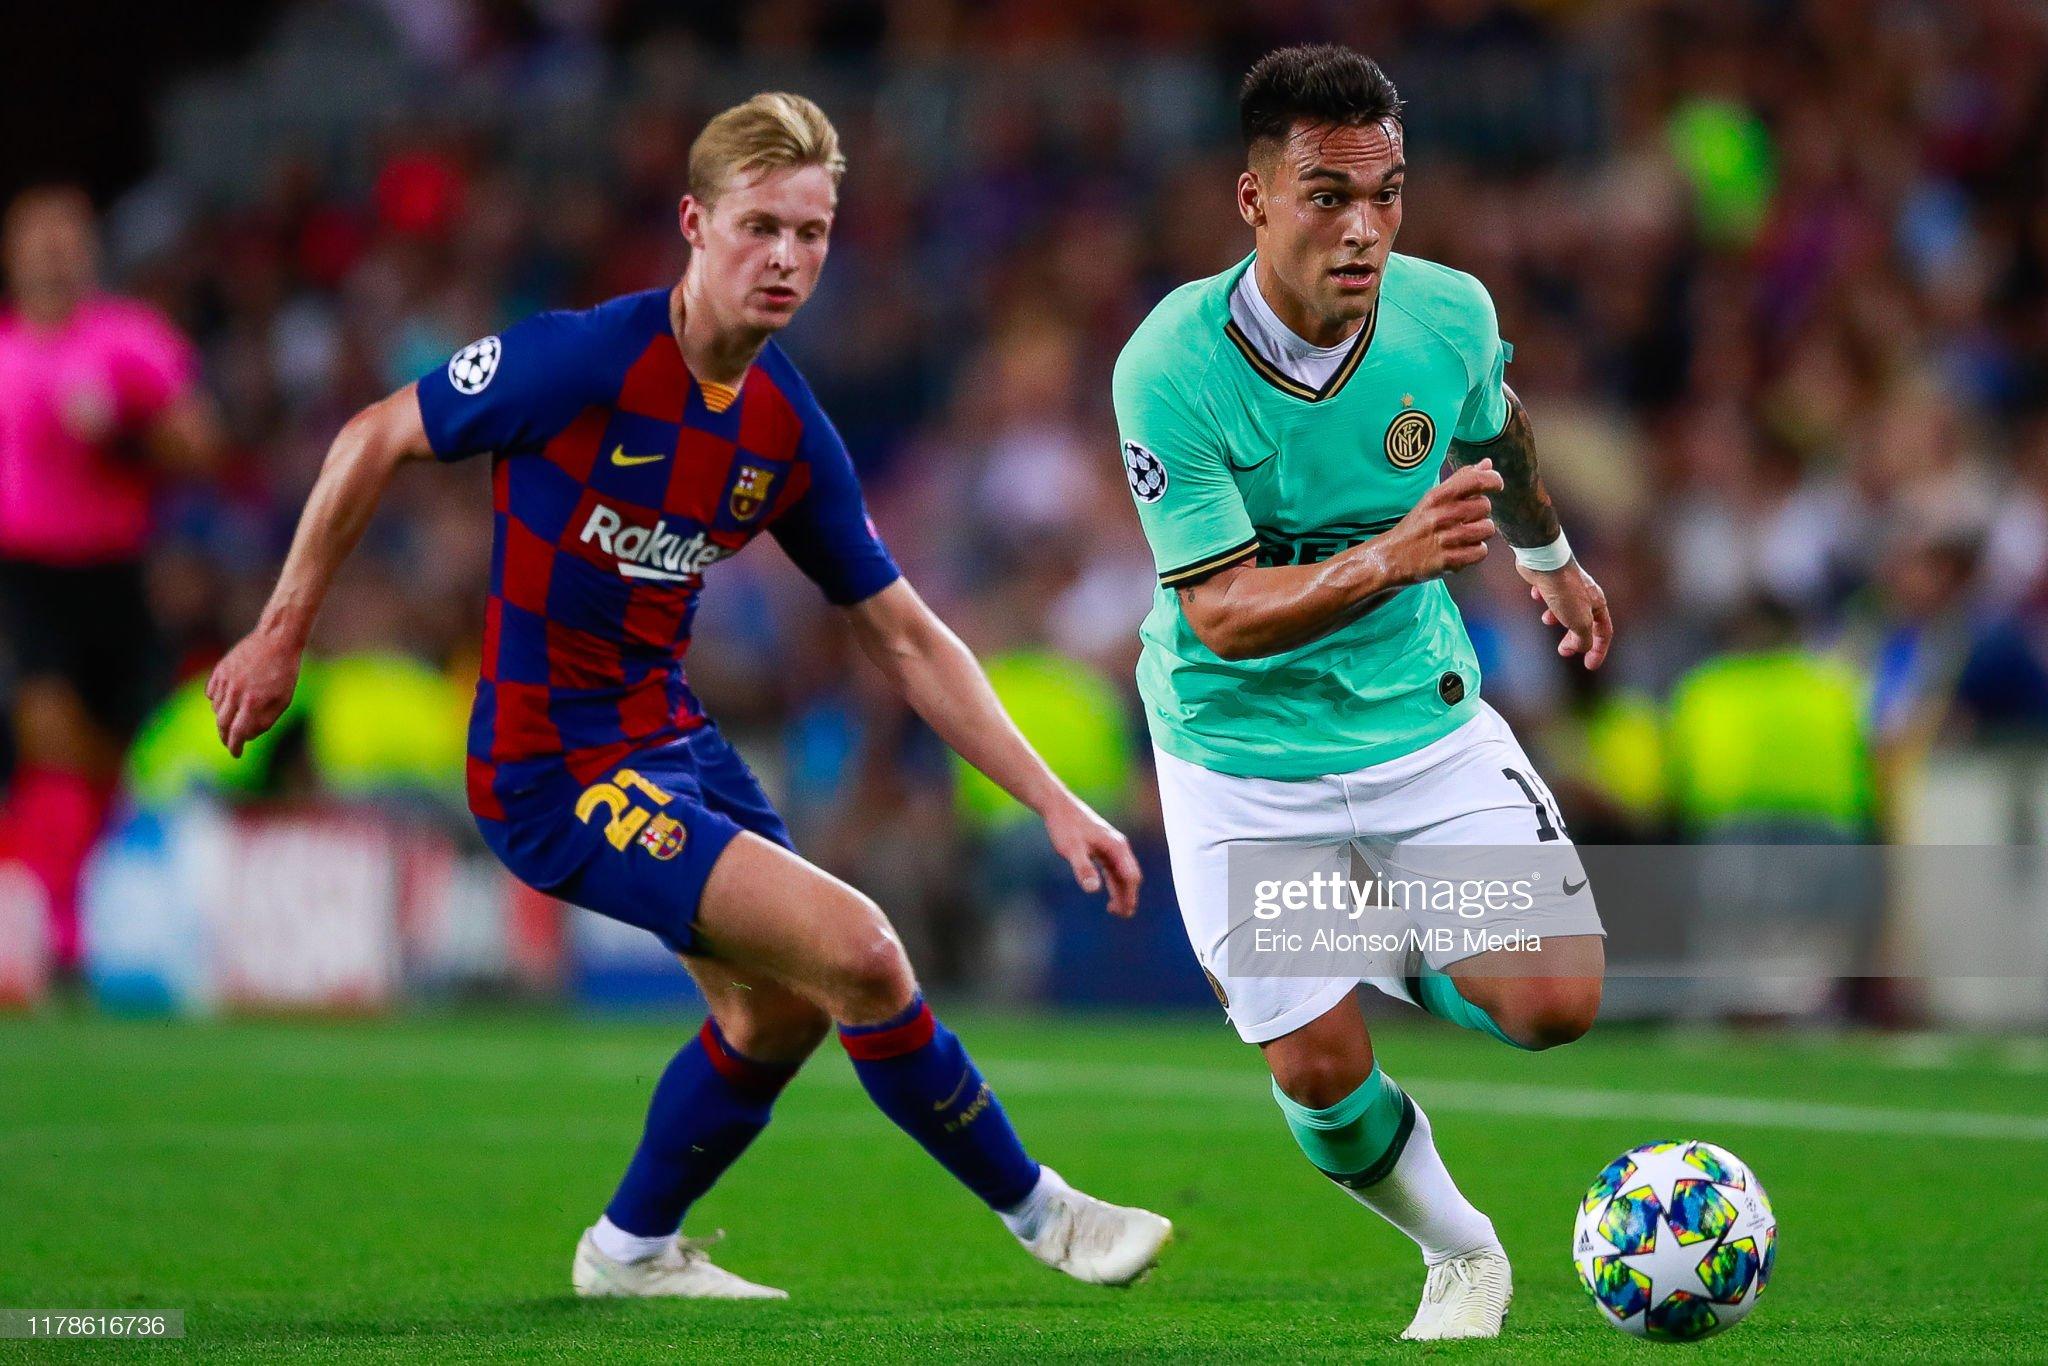 صور مباراة : برشلونة - إنتر 2-1 ( 02-10-2019 )  Lautaro-martinez-of-fc-internazionale-fight-for-the-ball-against-de-picture-id1178616736?s=2048x2048